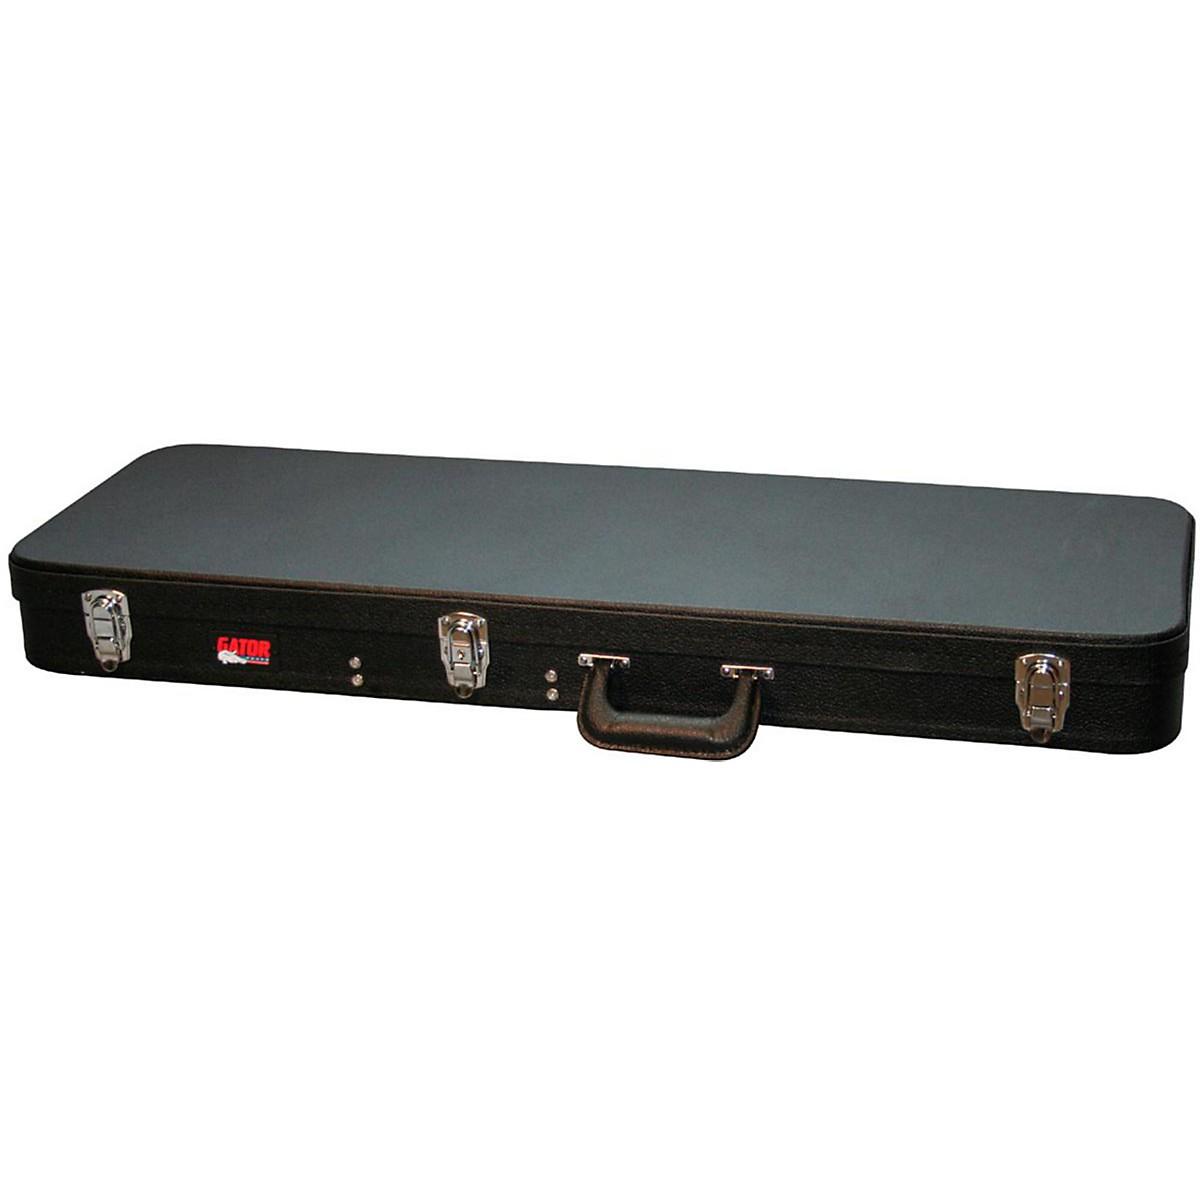 Gator GWE-Elec Hardshell Electric Guitar Case